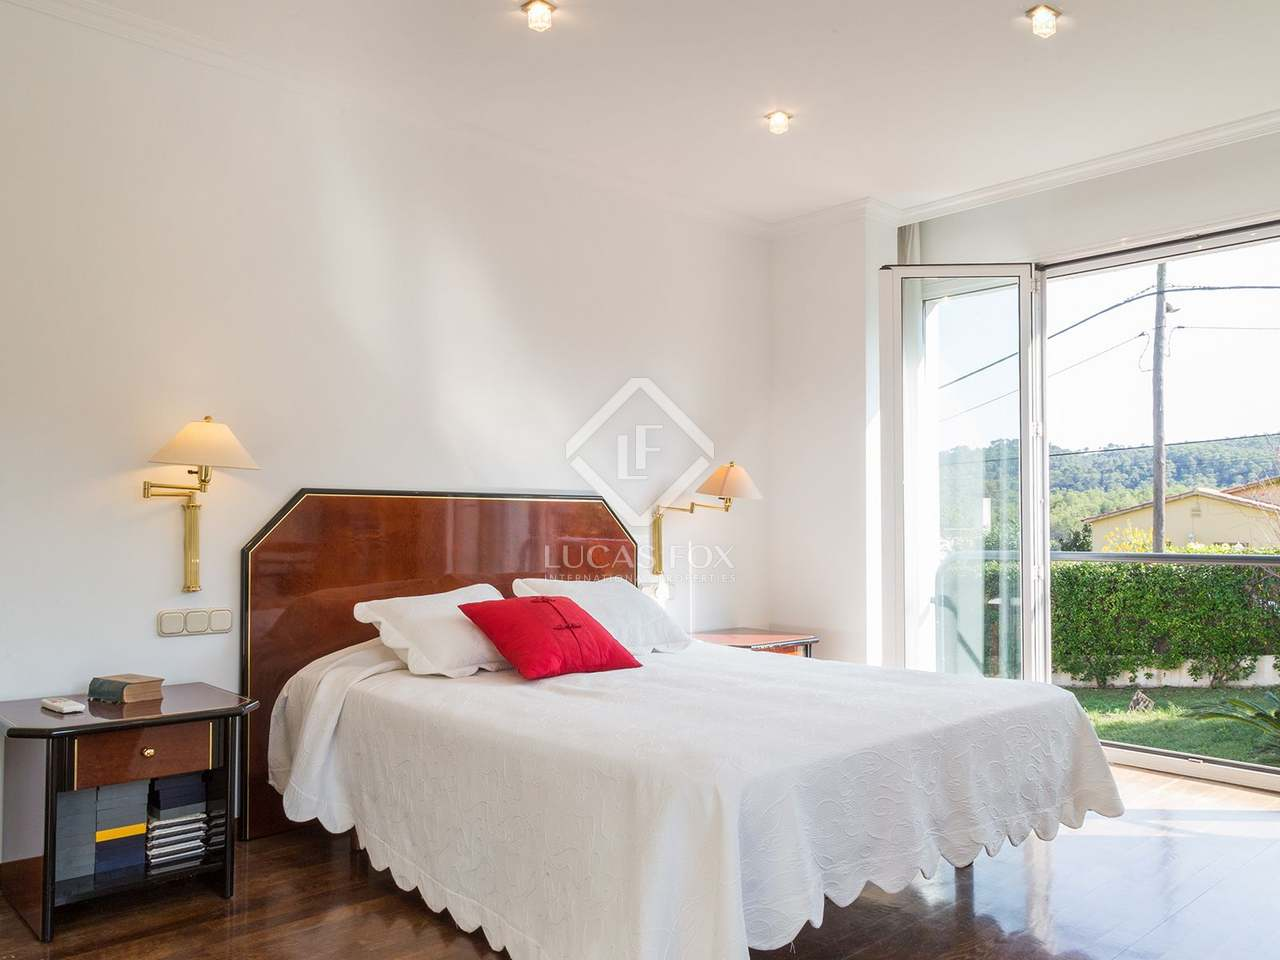 Casa en alquiler en valldoreix sant cugat for Alquiler casa jardin barcelona